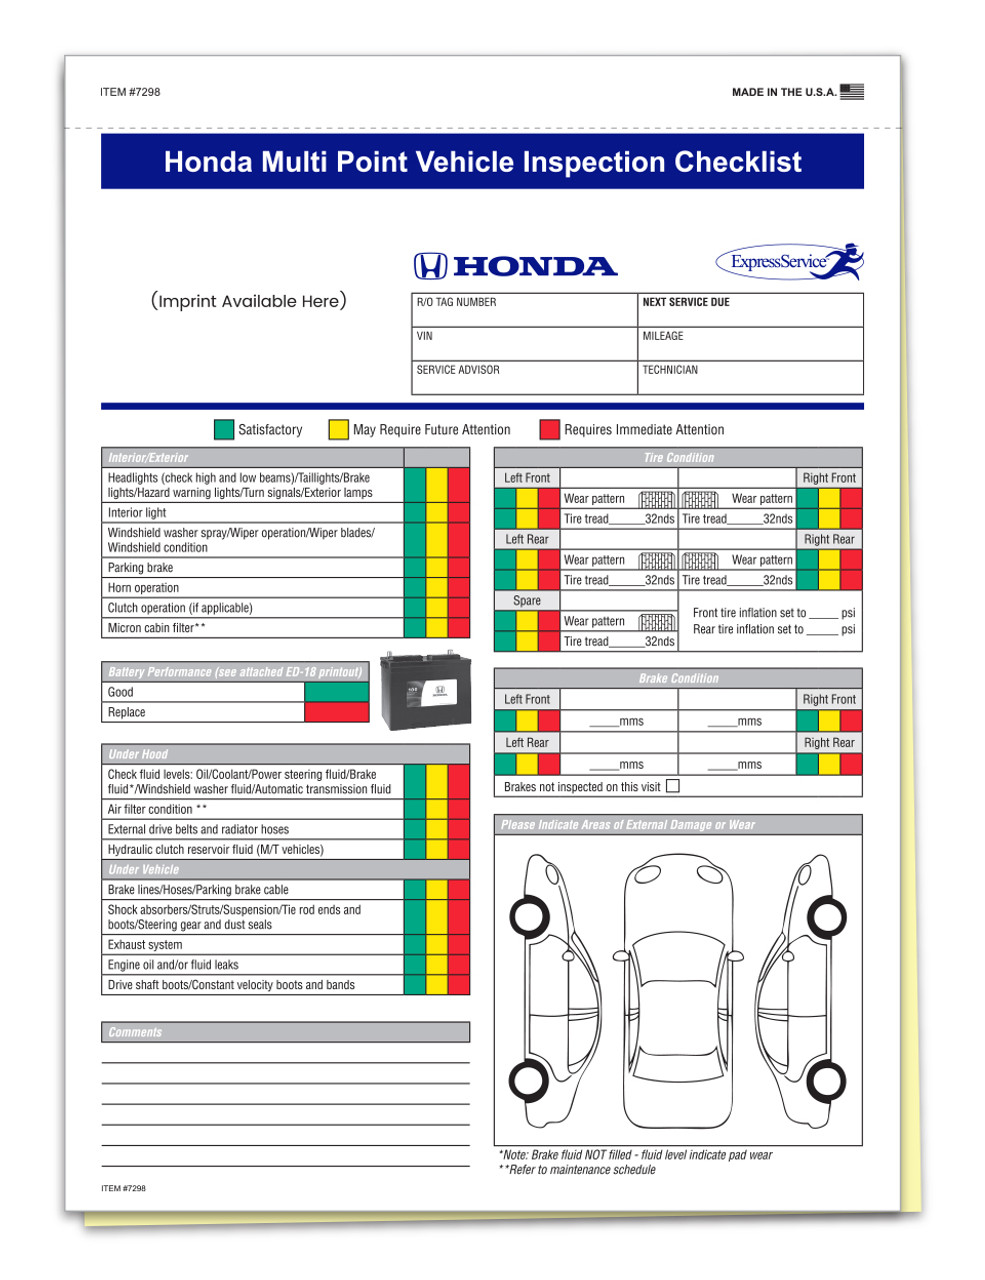 Custom Imprint Manufacturer Specific - Honda Multi-Point Inspection 2 Part Form (Form-#7298-IMP)